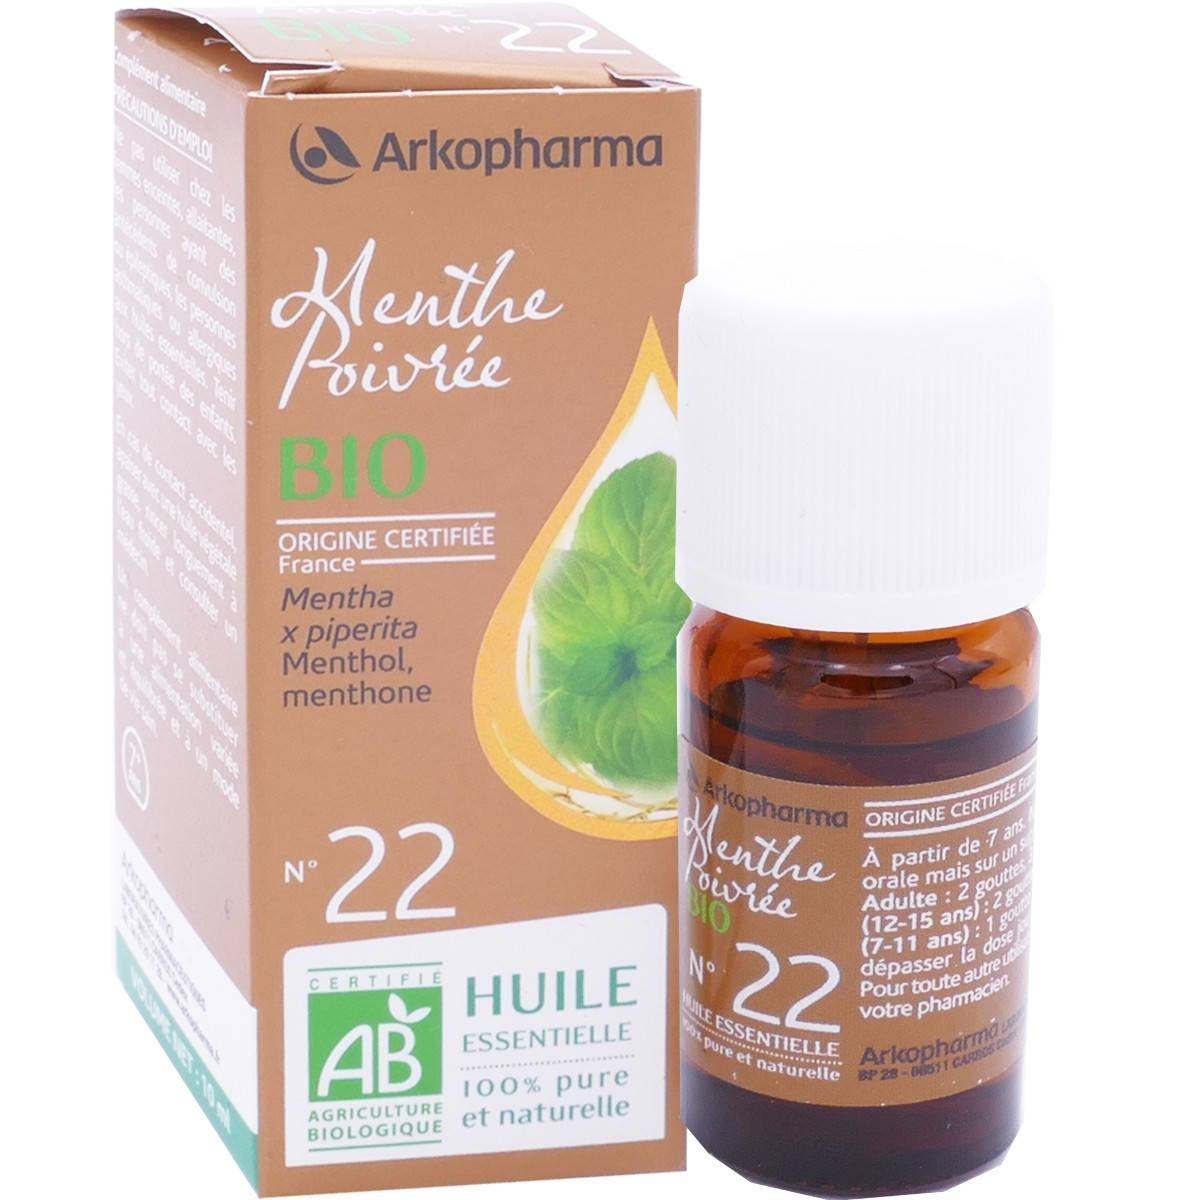 Arkopharma menthe poivree bio n°22 10 ml